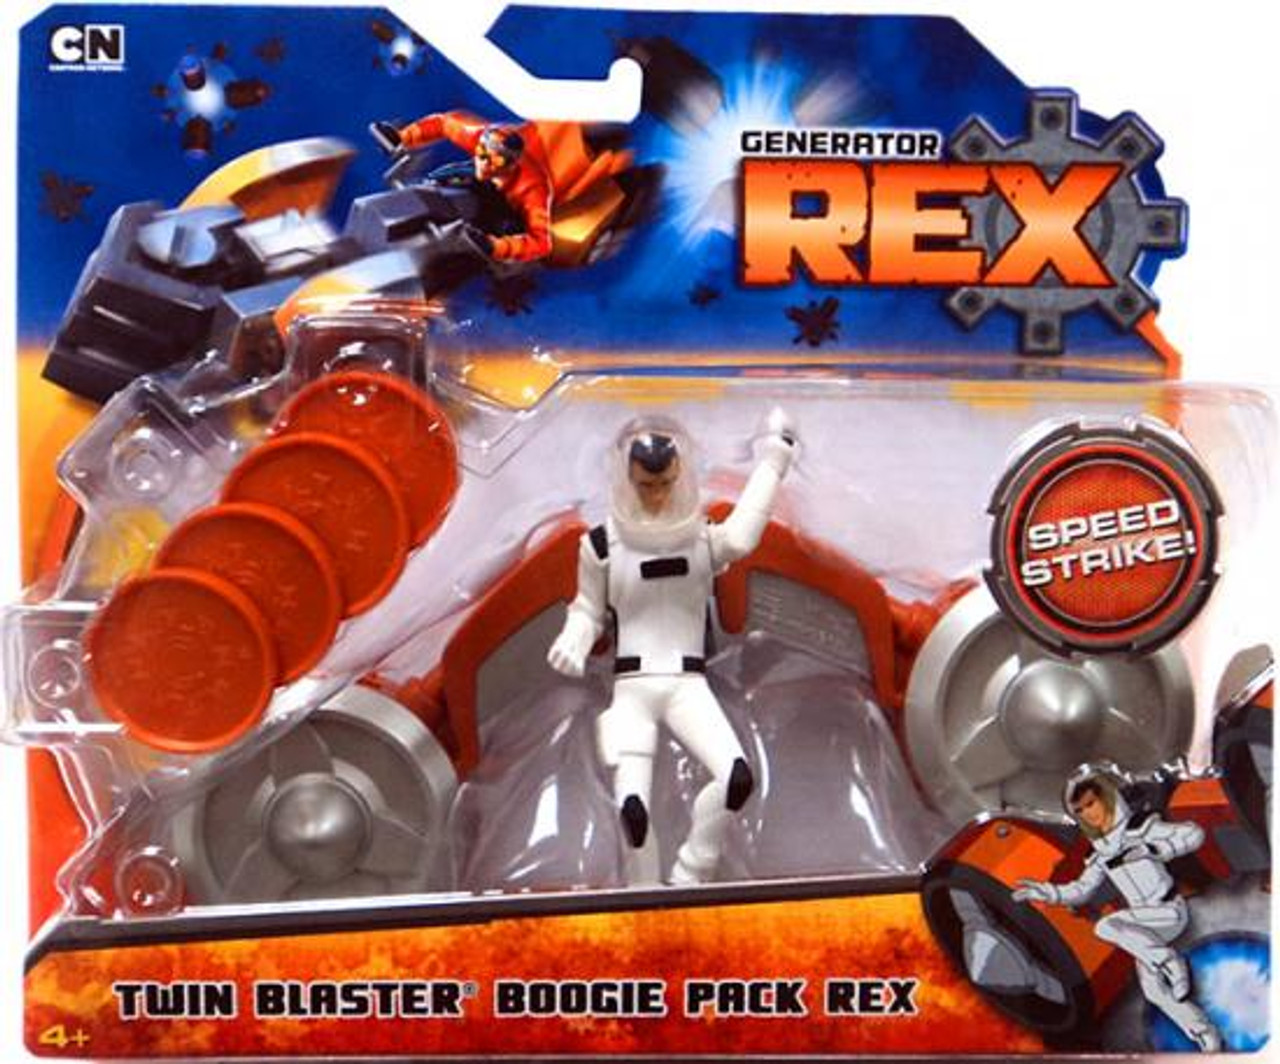 Generator Rex Twin Blaster Boogie Pack Rex Action Figure